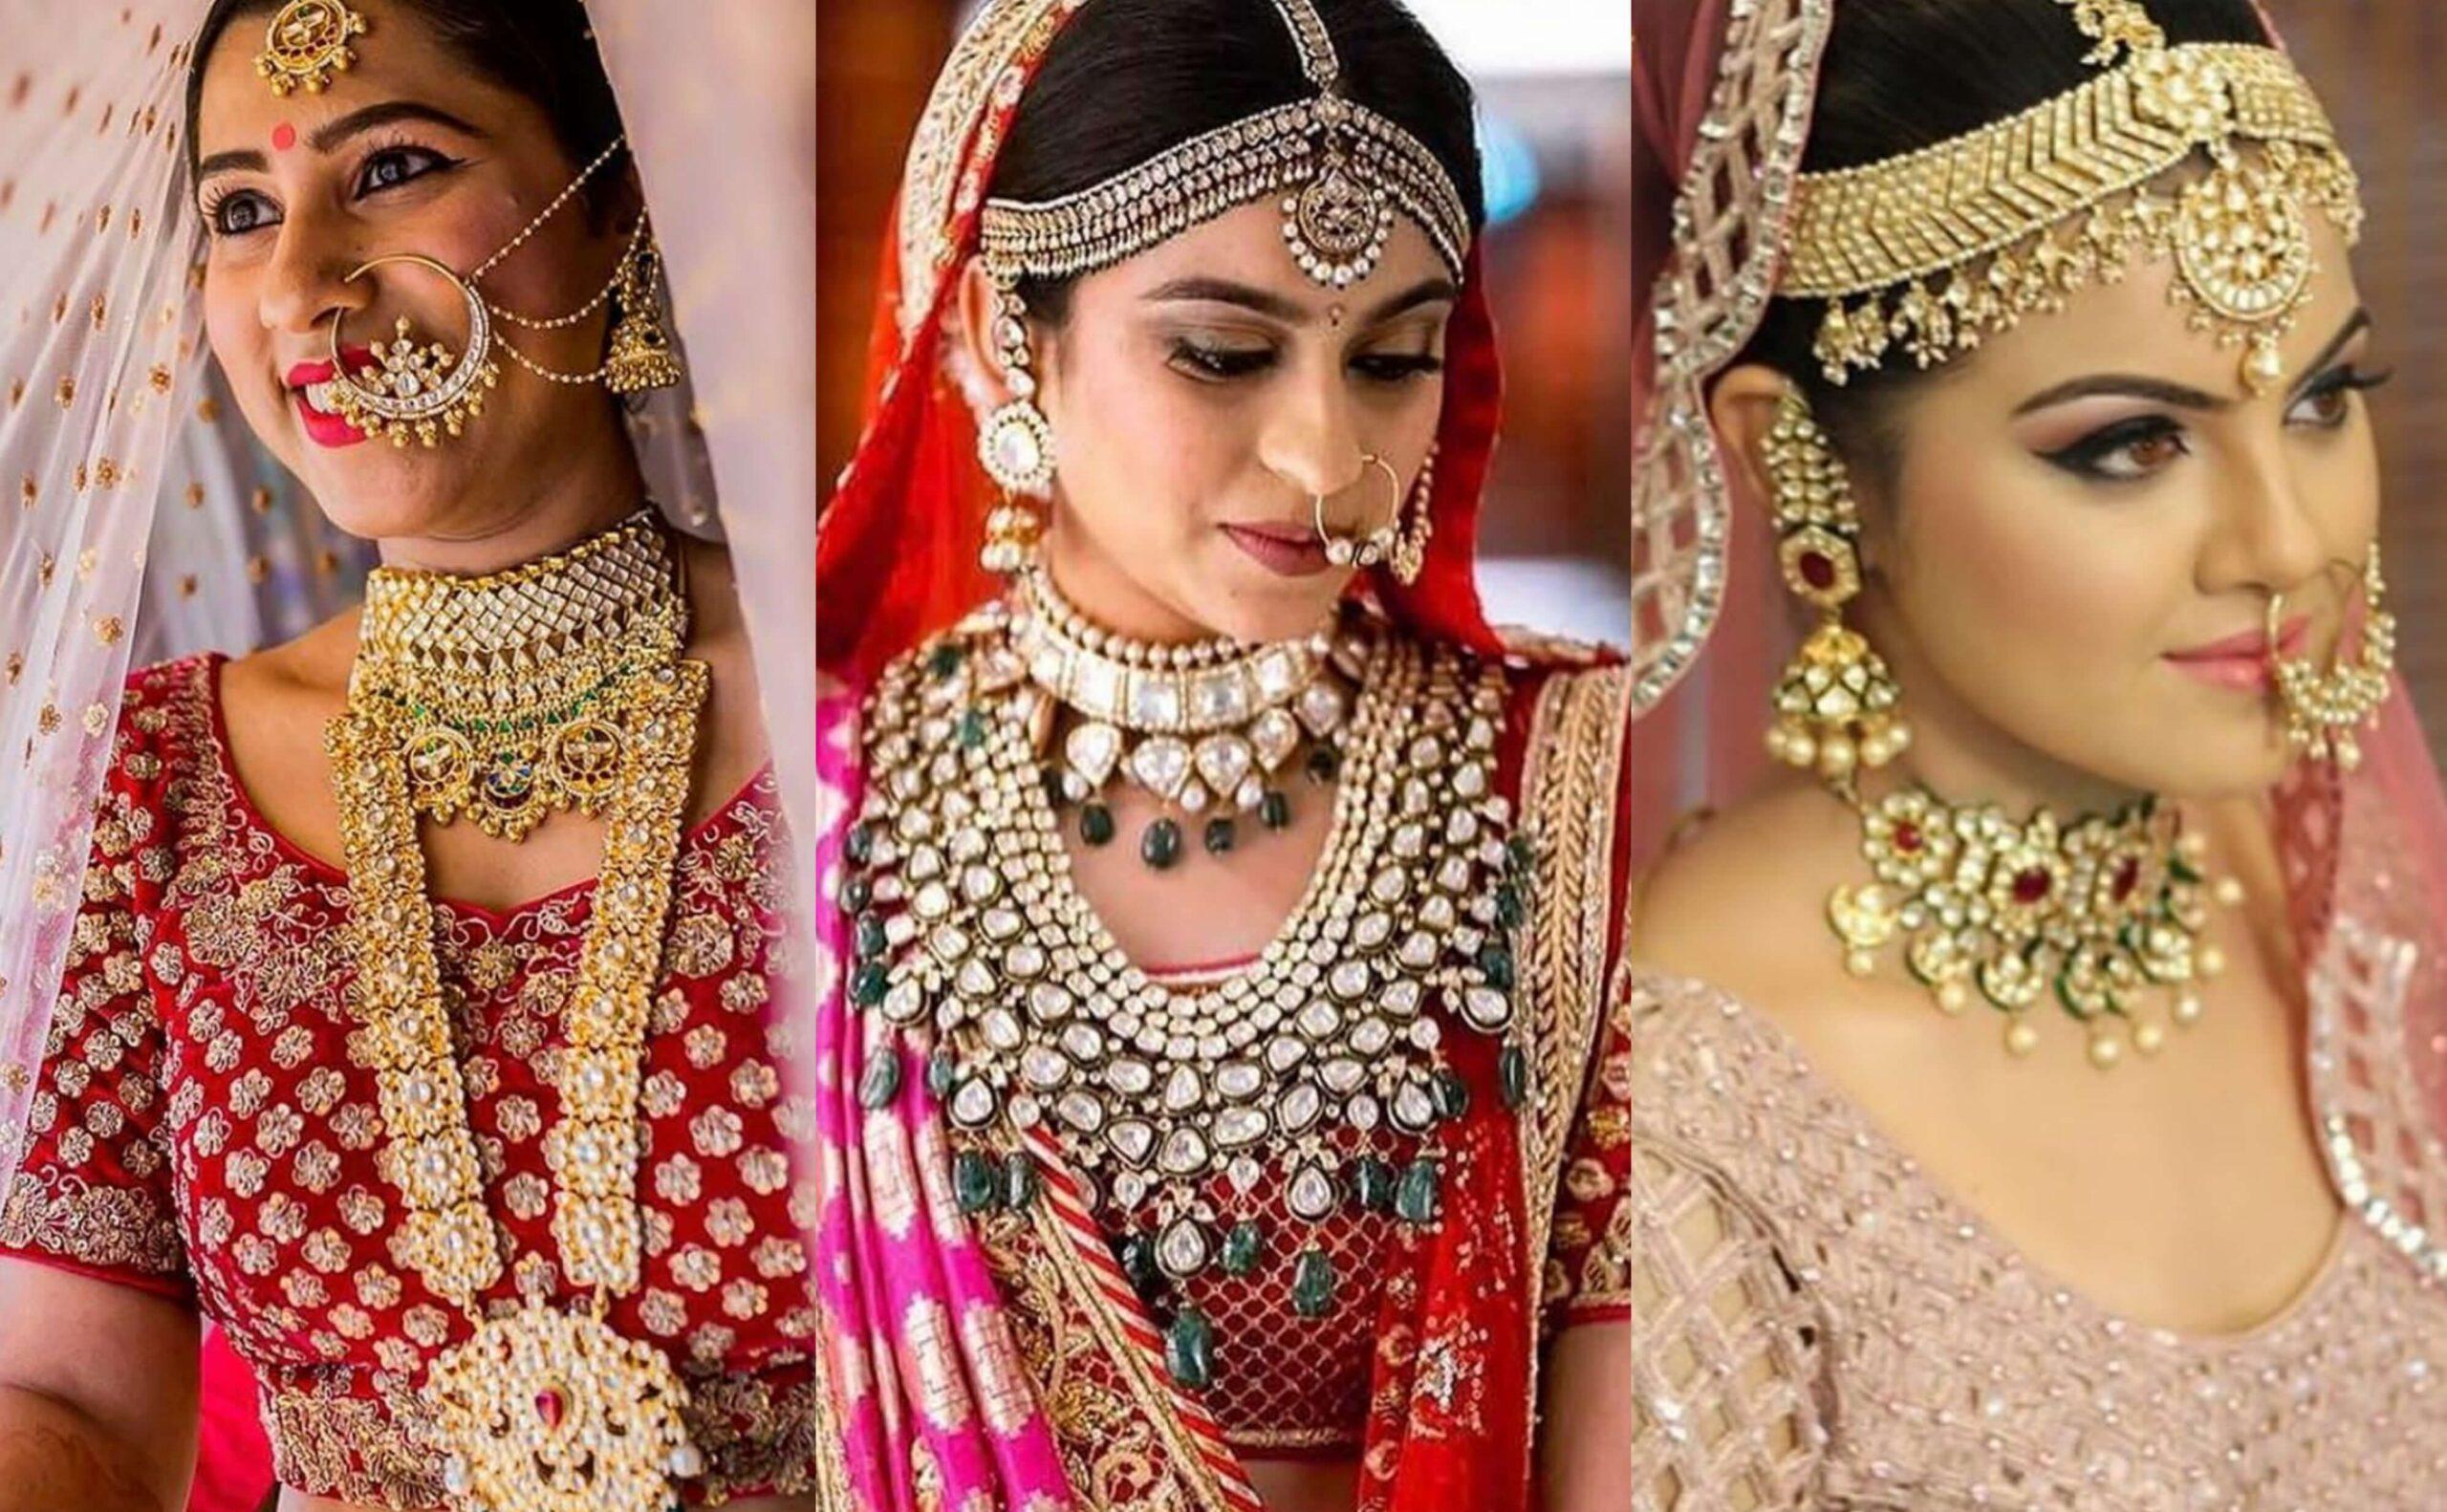 Bridals' Jewelry